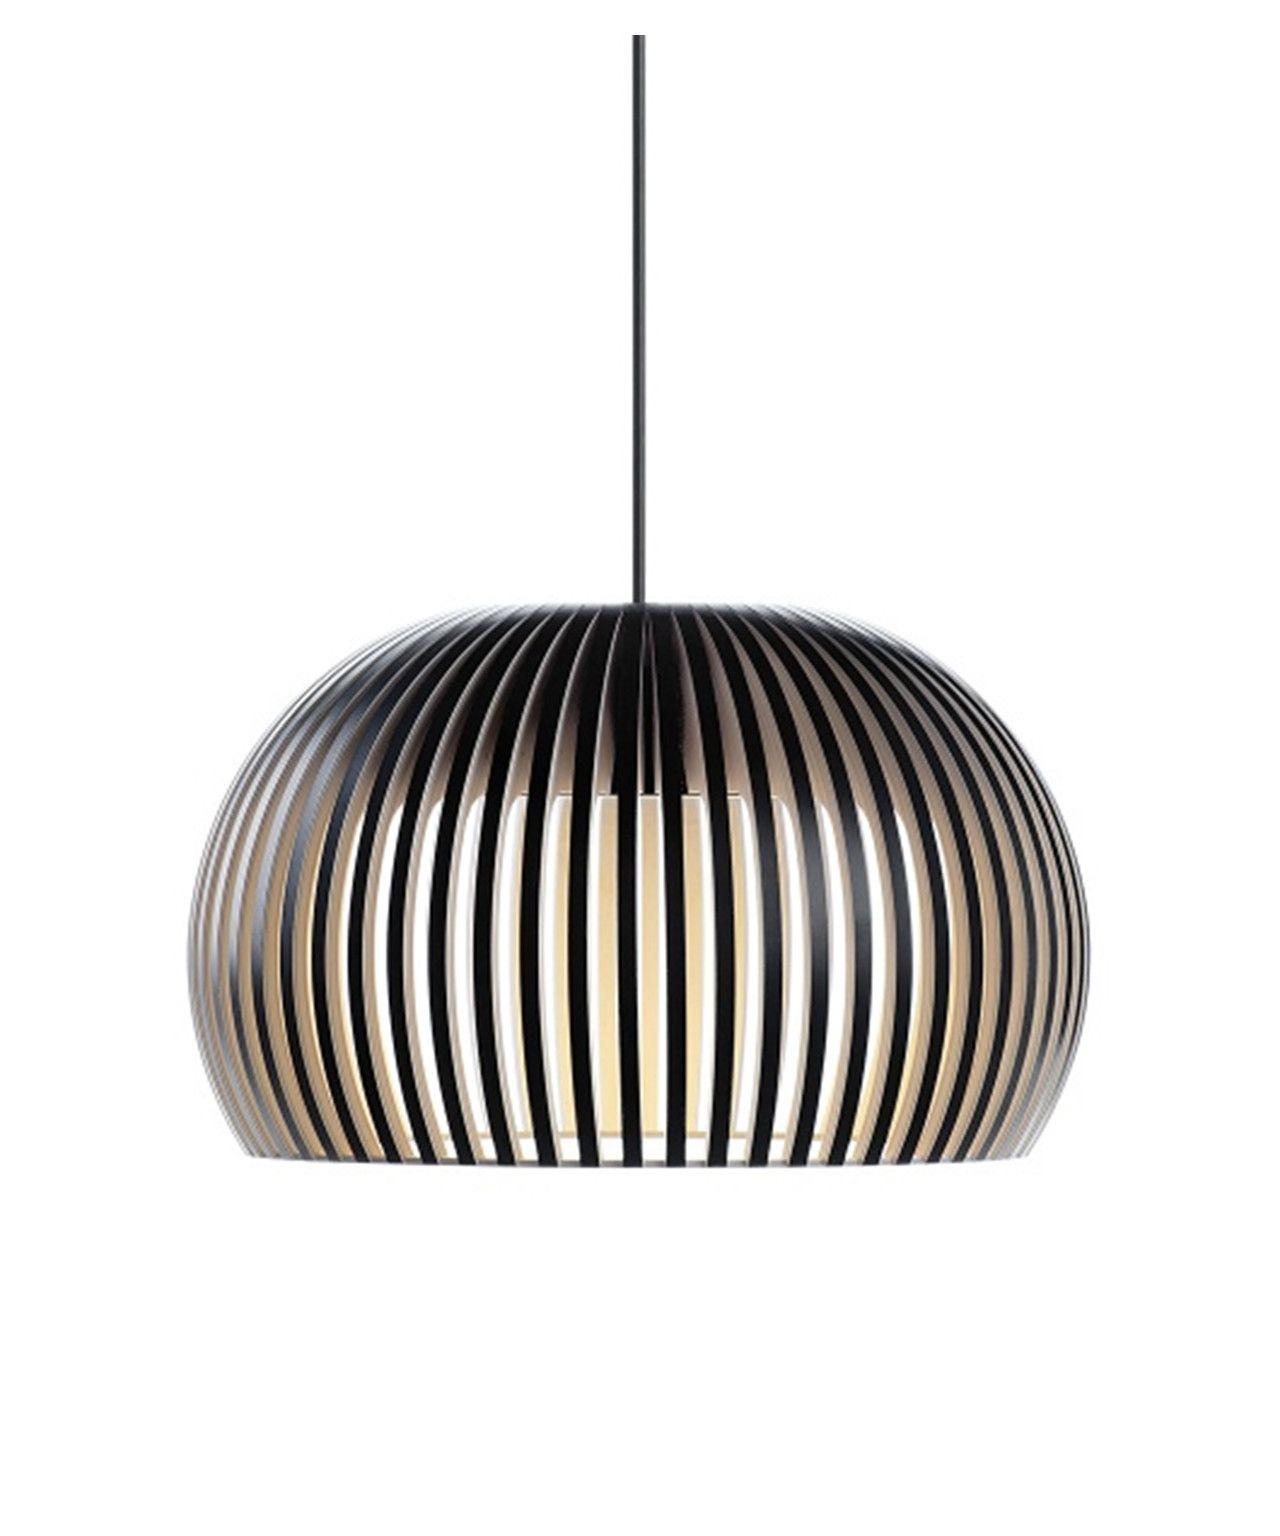 Atto 5000 Pendel Svart Secto Pendellampe Lampe Design Lamper